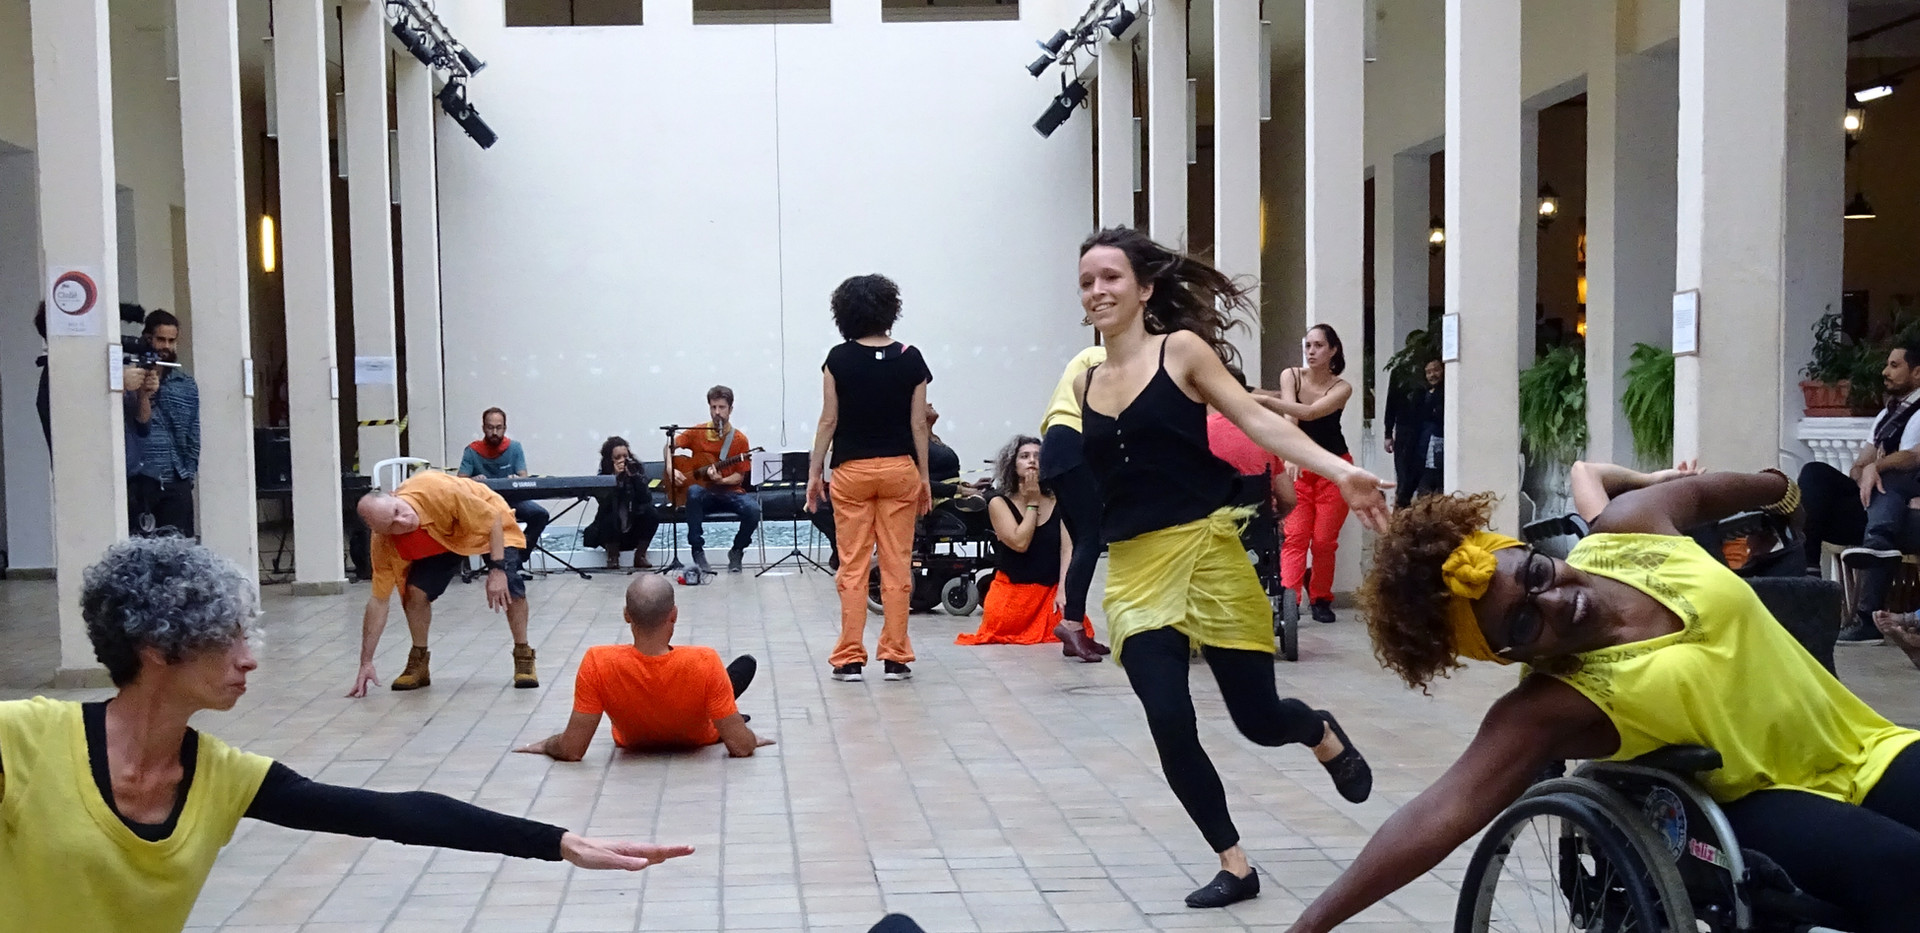 Núcleo Dança Aberta, Brazil